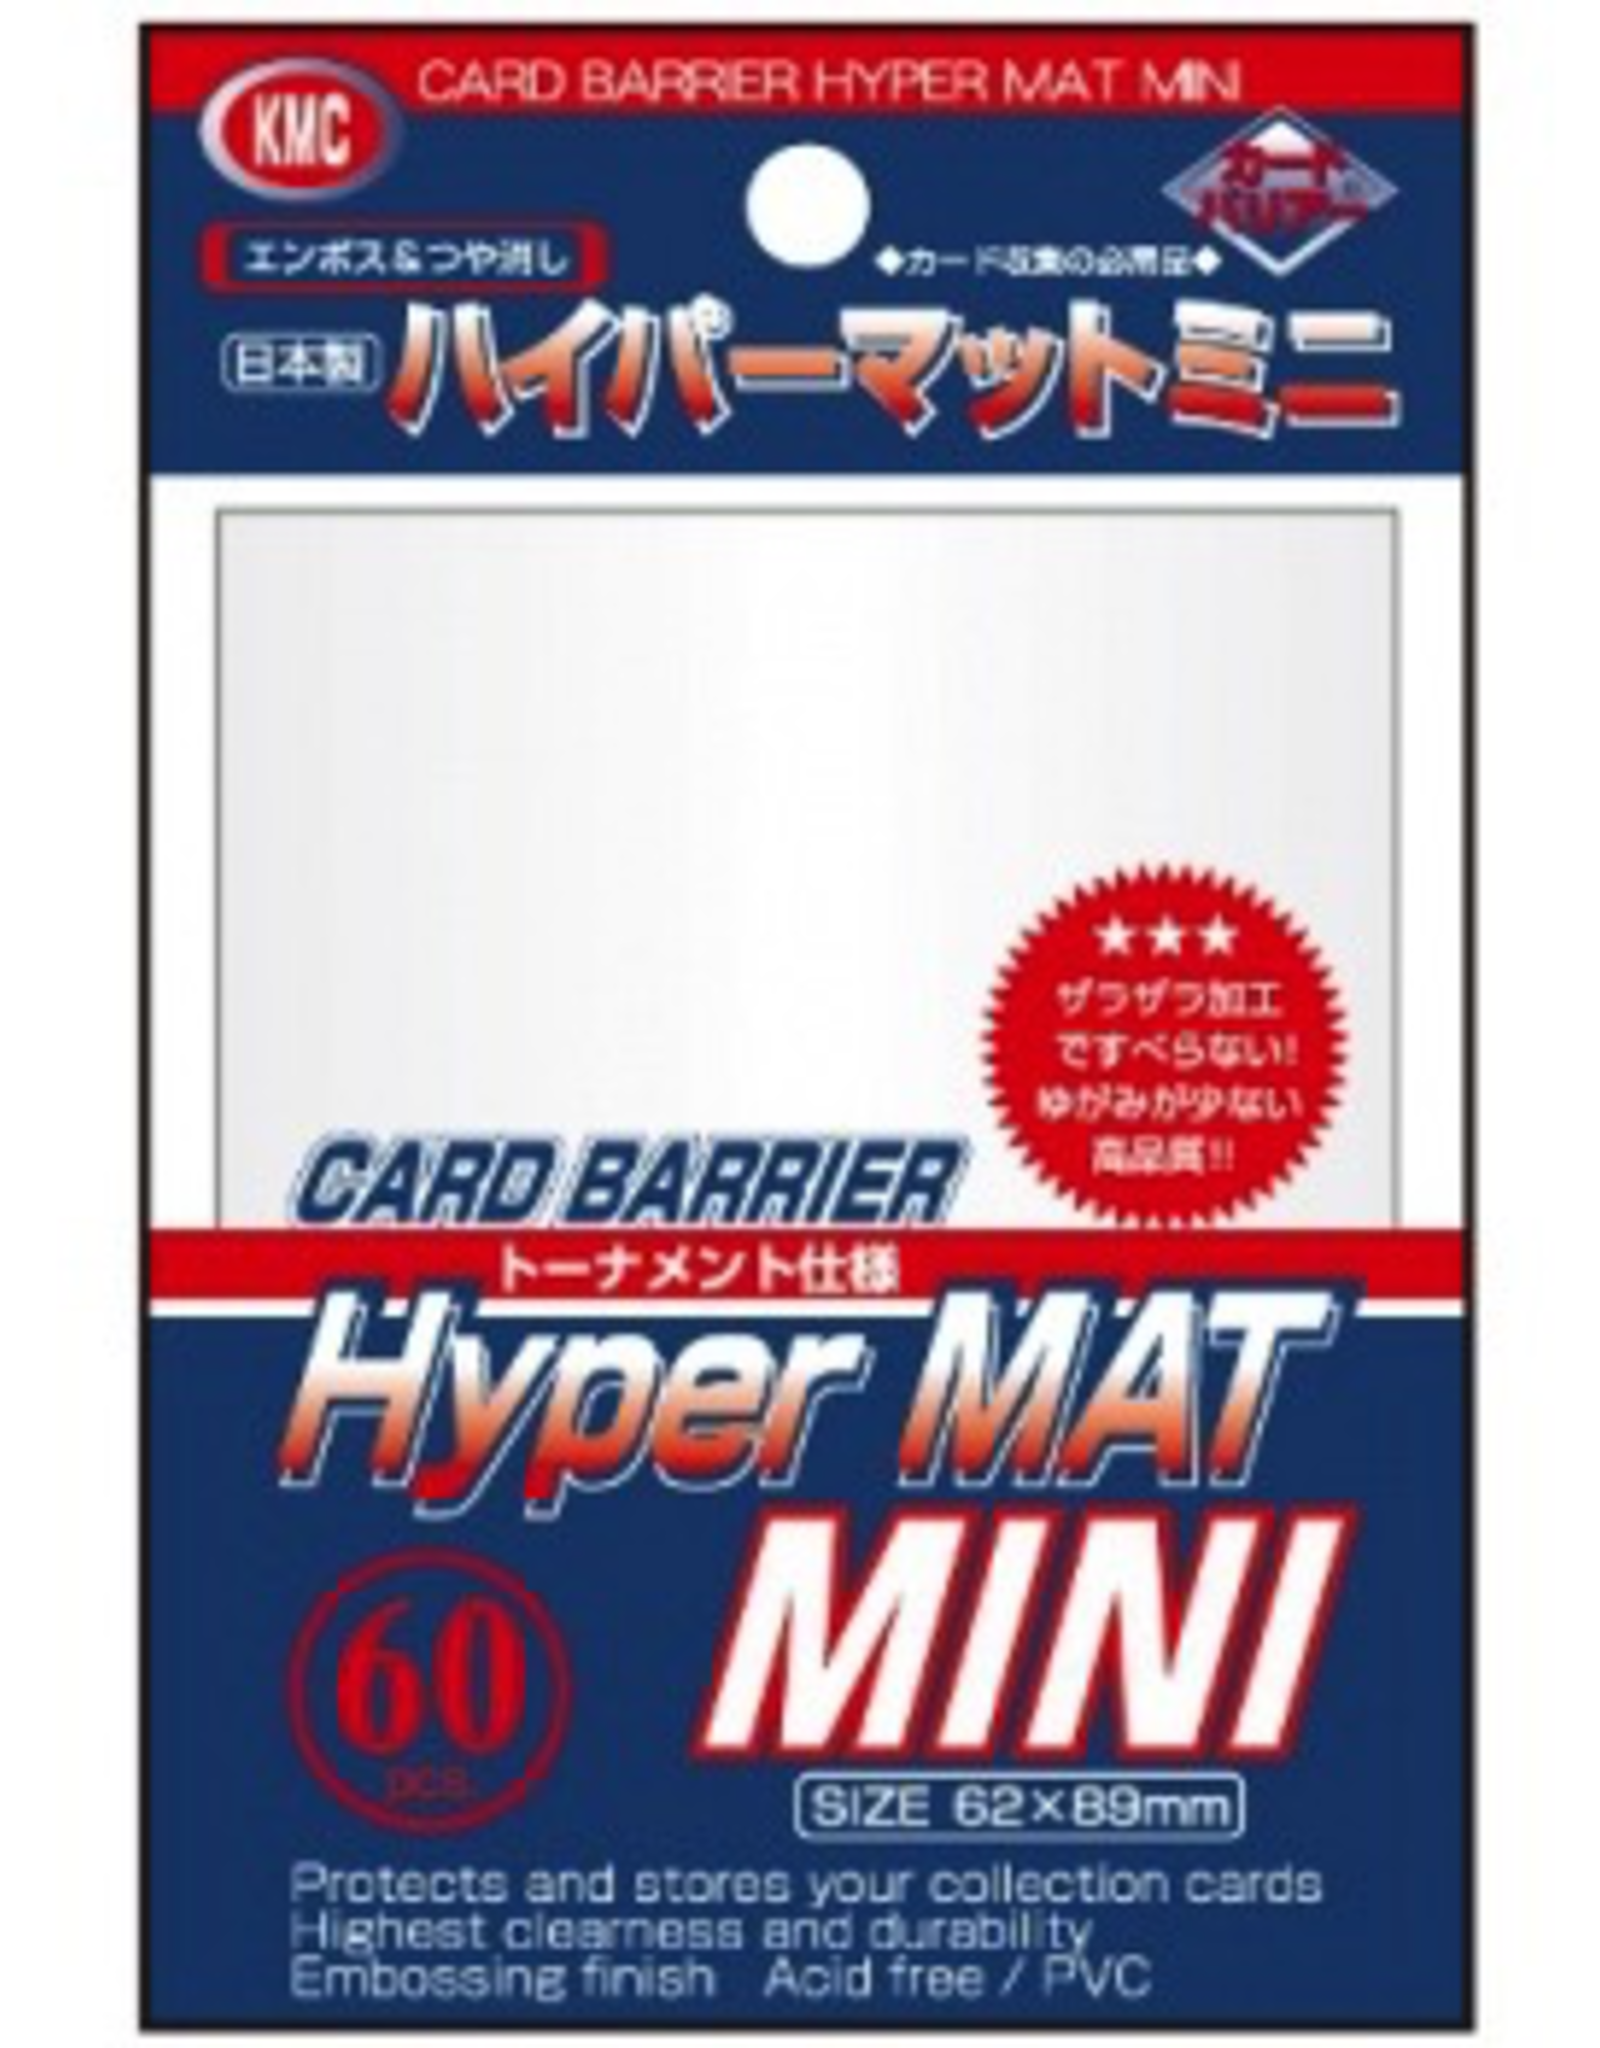 KMC - Small Sleeves KMC Small Sleeves - Hyper Mat White (60 Sleeves)